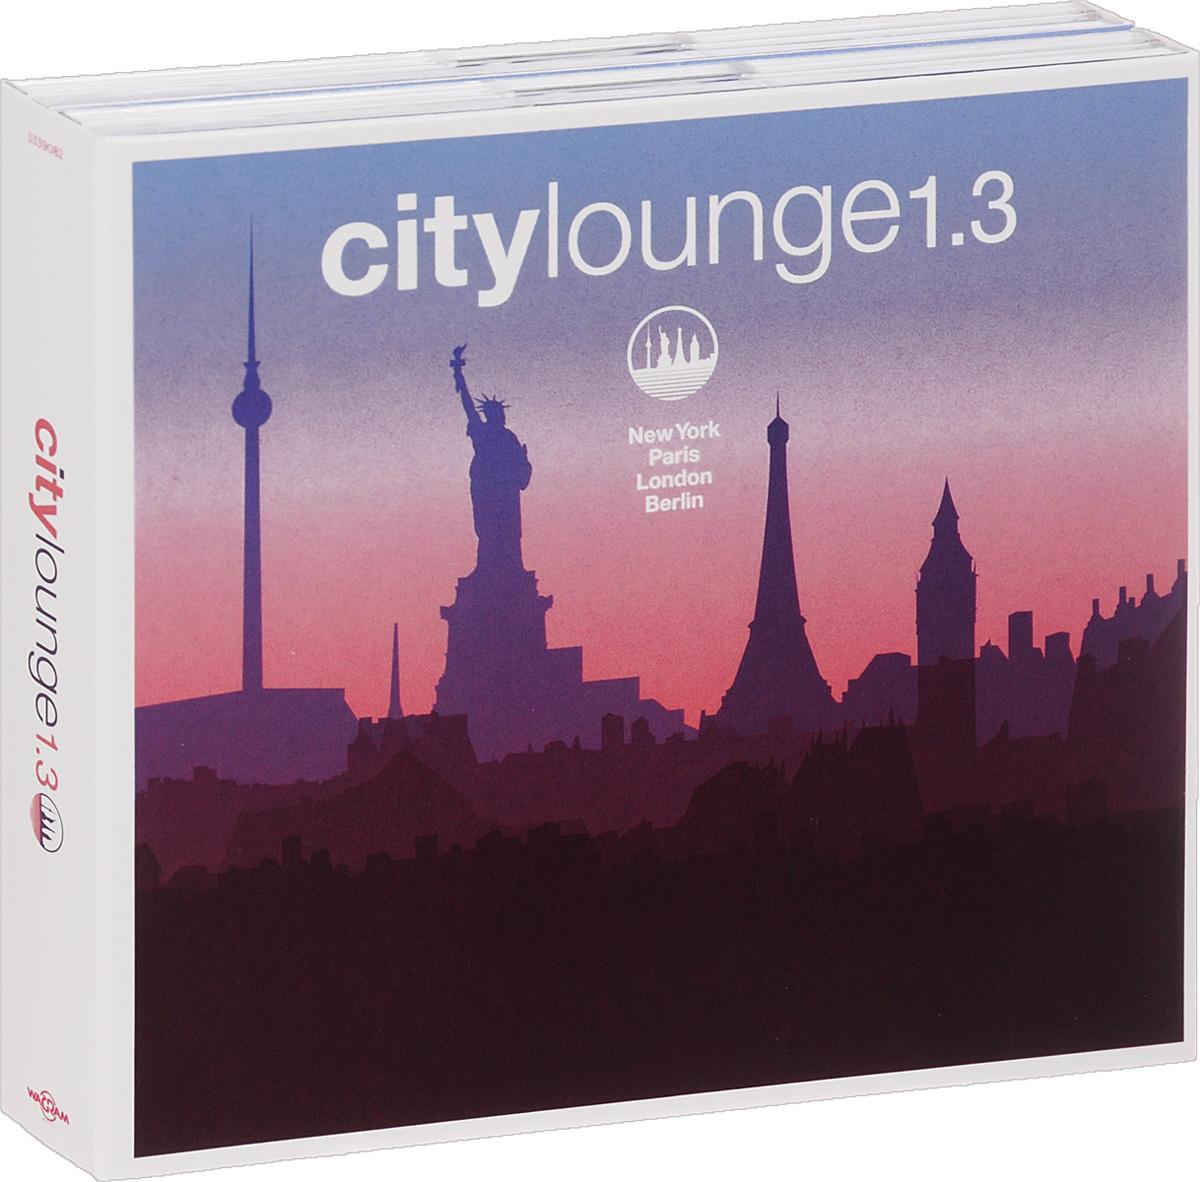 City Lounge 1.3 (4 CD)